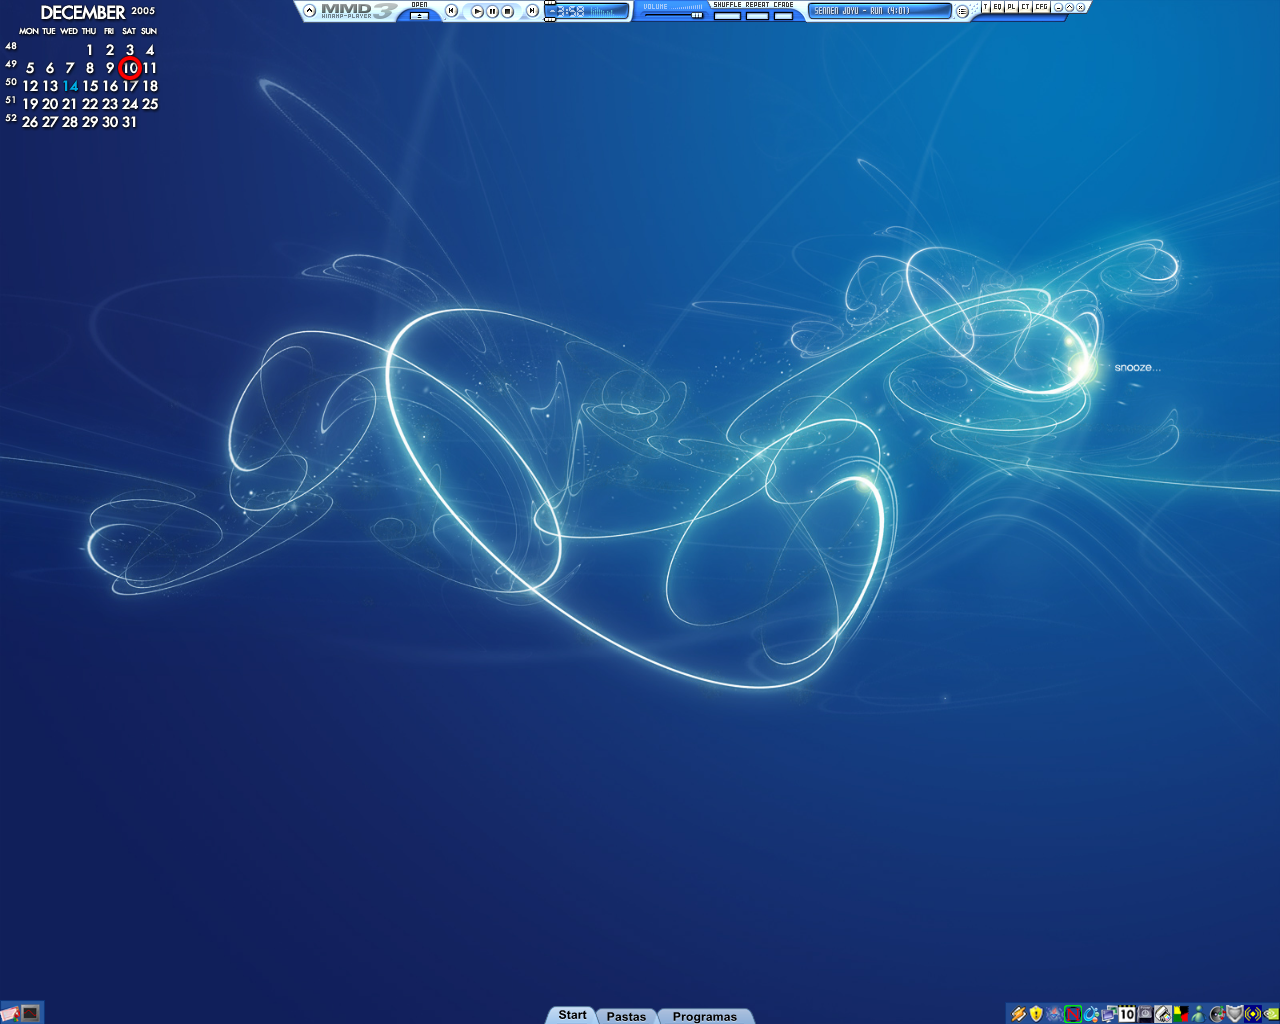 Desktop for December 10th 2005